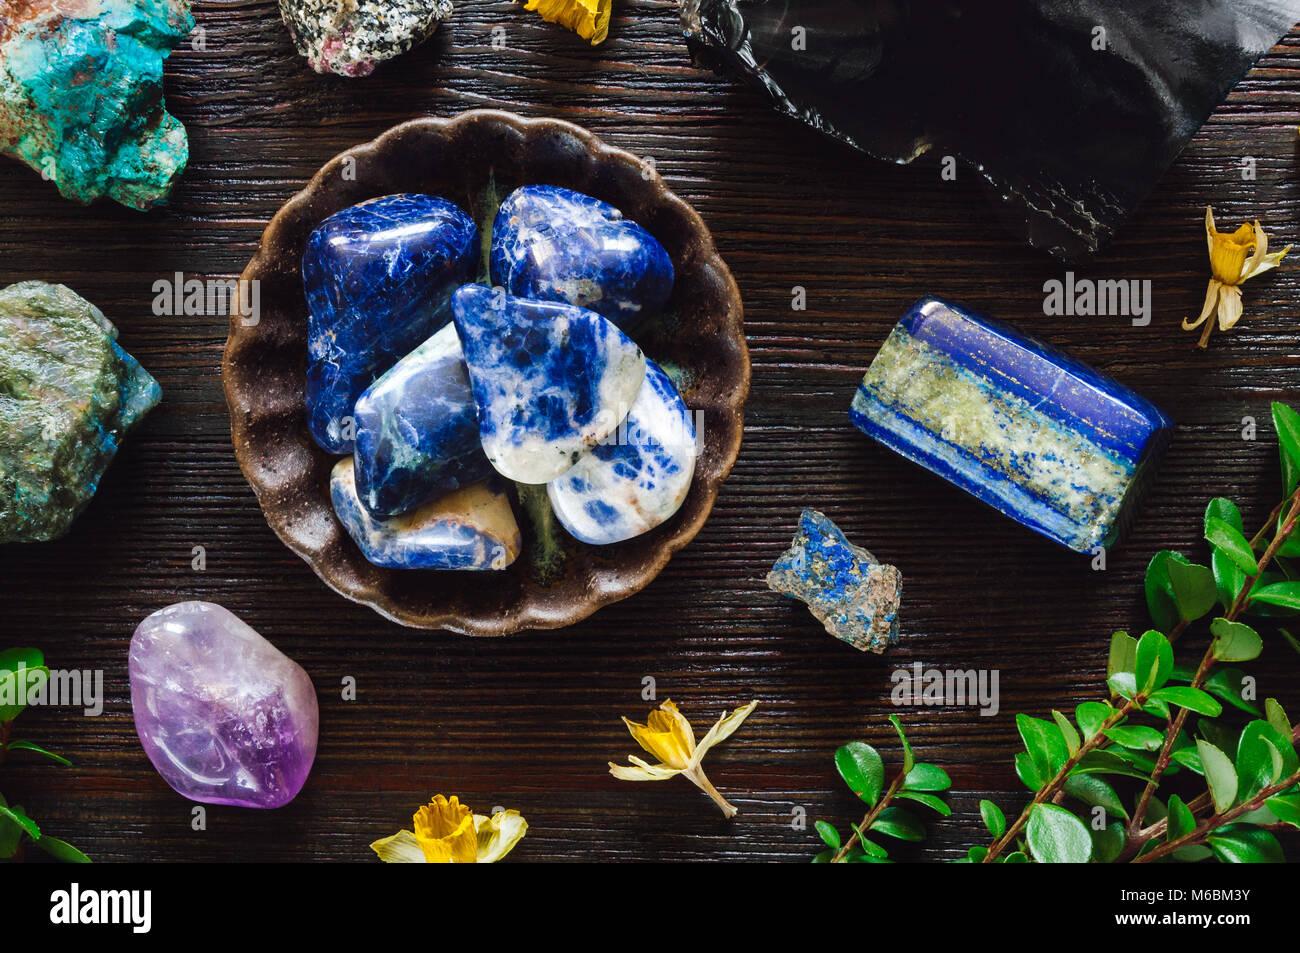 Stones of Sagittarius, including Sodalite, Lapis Lazuli, Labradorite, Turquoise, Azurite, Obsidian, Amethyst and - Stock Image